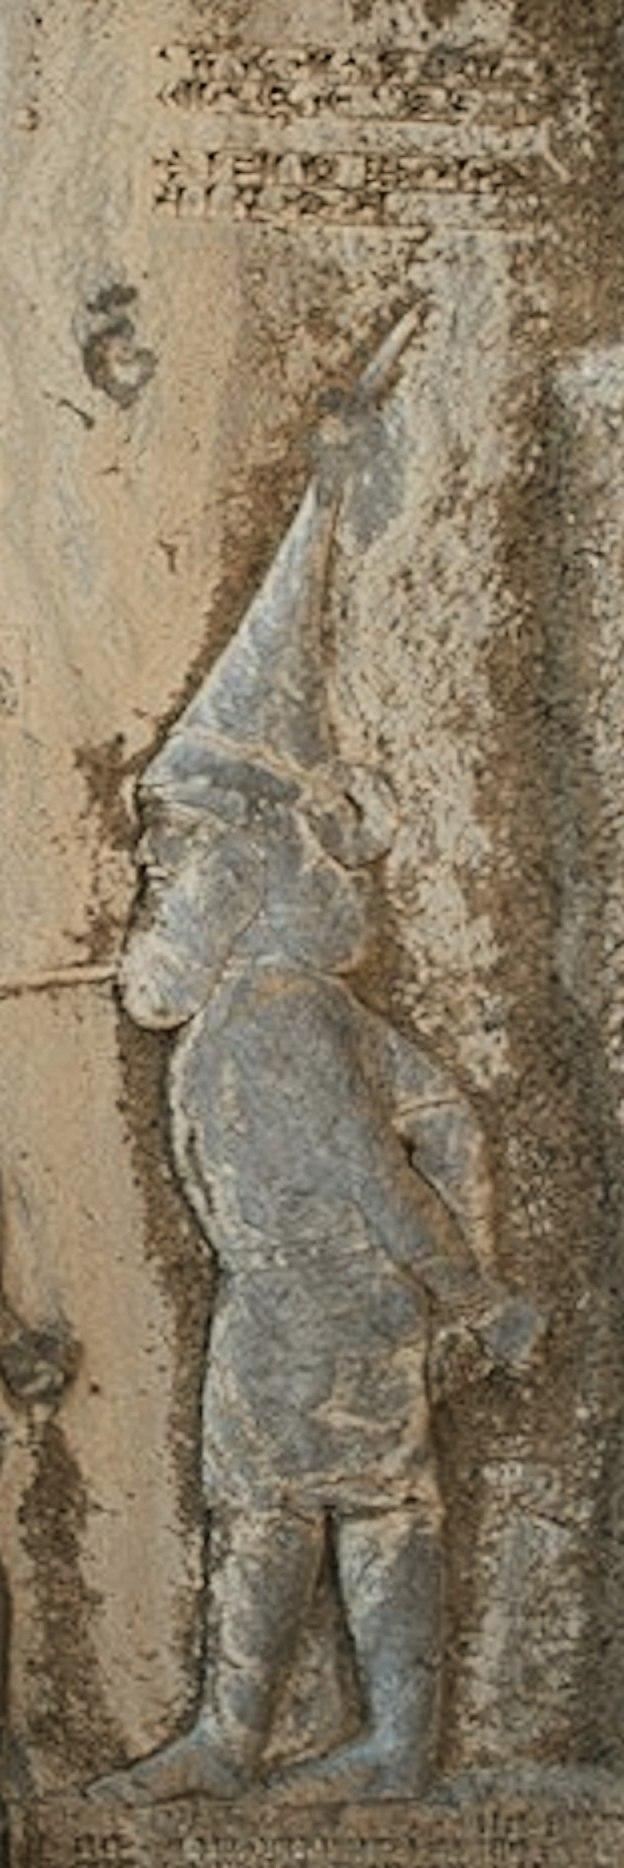 Behistun relief Skunkha